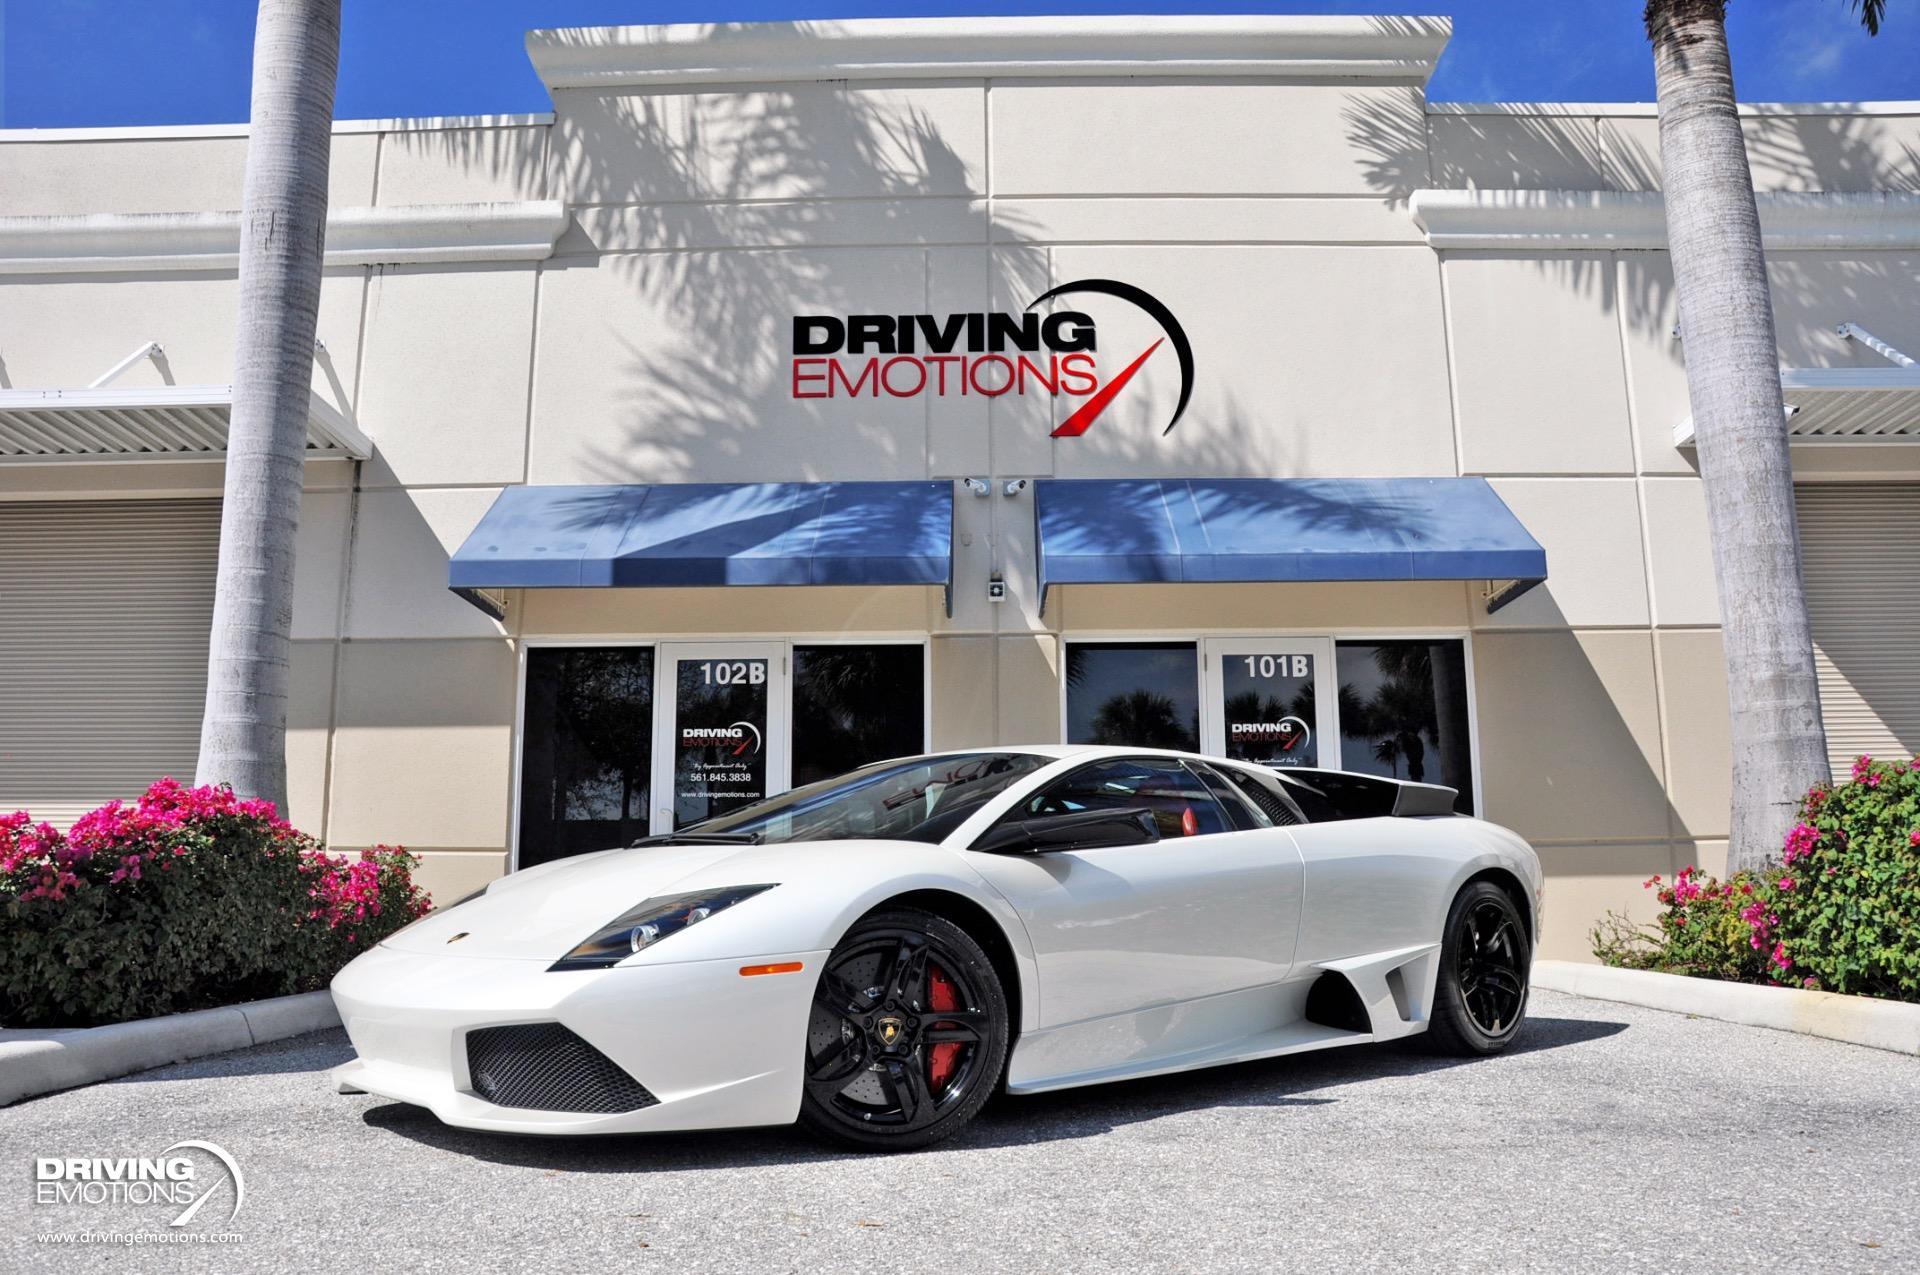 Used 2009 Lamborghini Murcielago LP640 Coupe LP 640 WHITE/RED! | Lake Park, FL